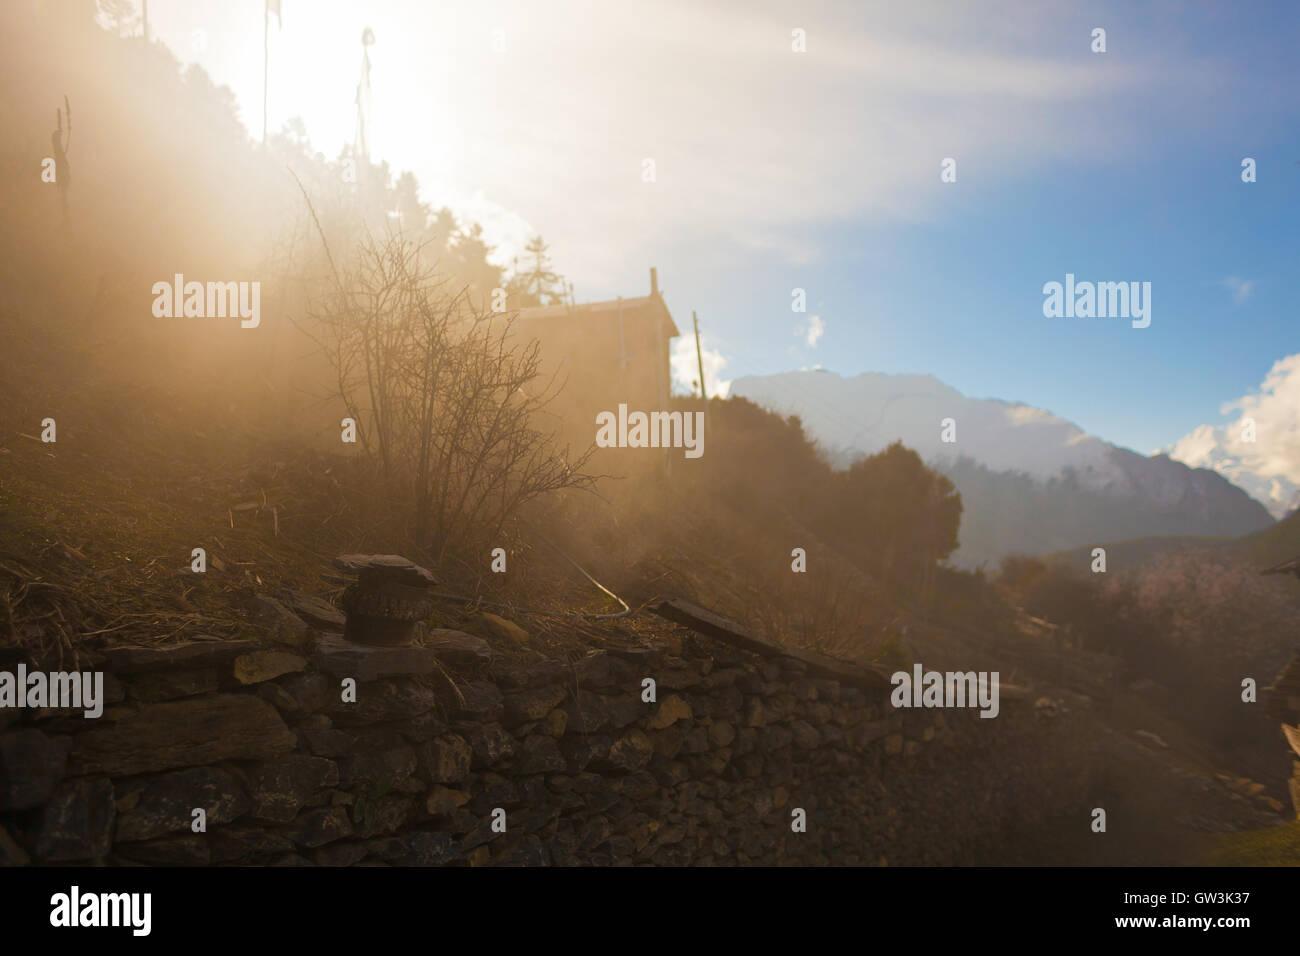 Landscapes Mountains Nature Morning Viewpoint.Mountain Trekking Landscape Background. Nobody photo.Asia Horizontal - Stock Image